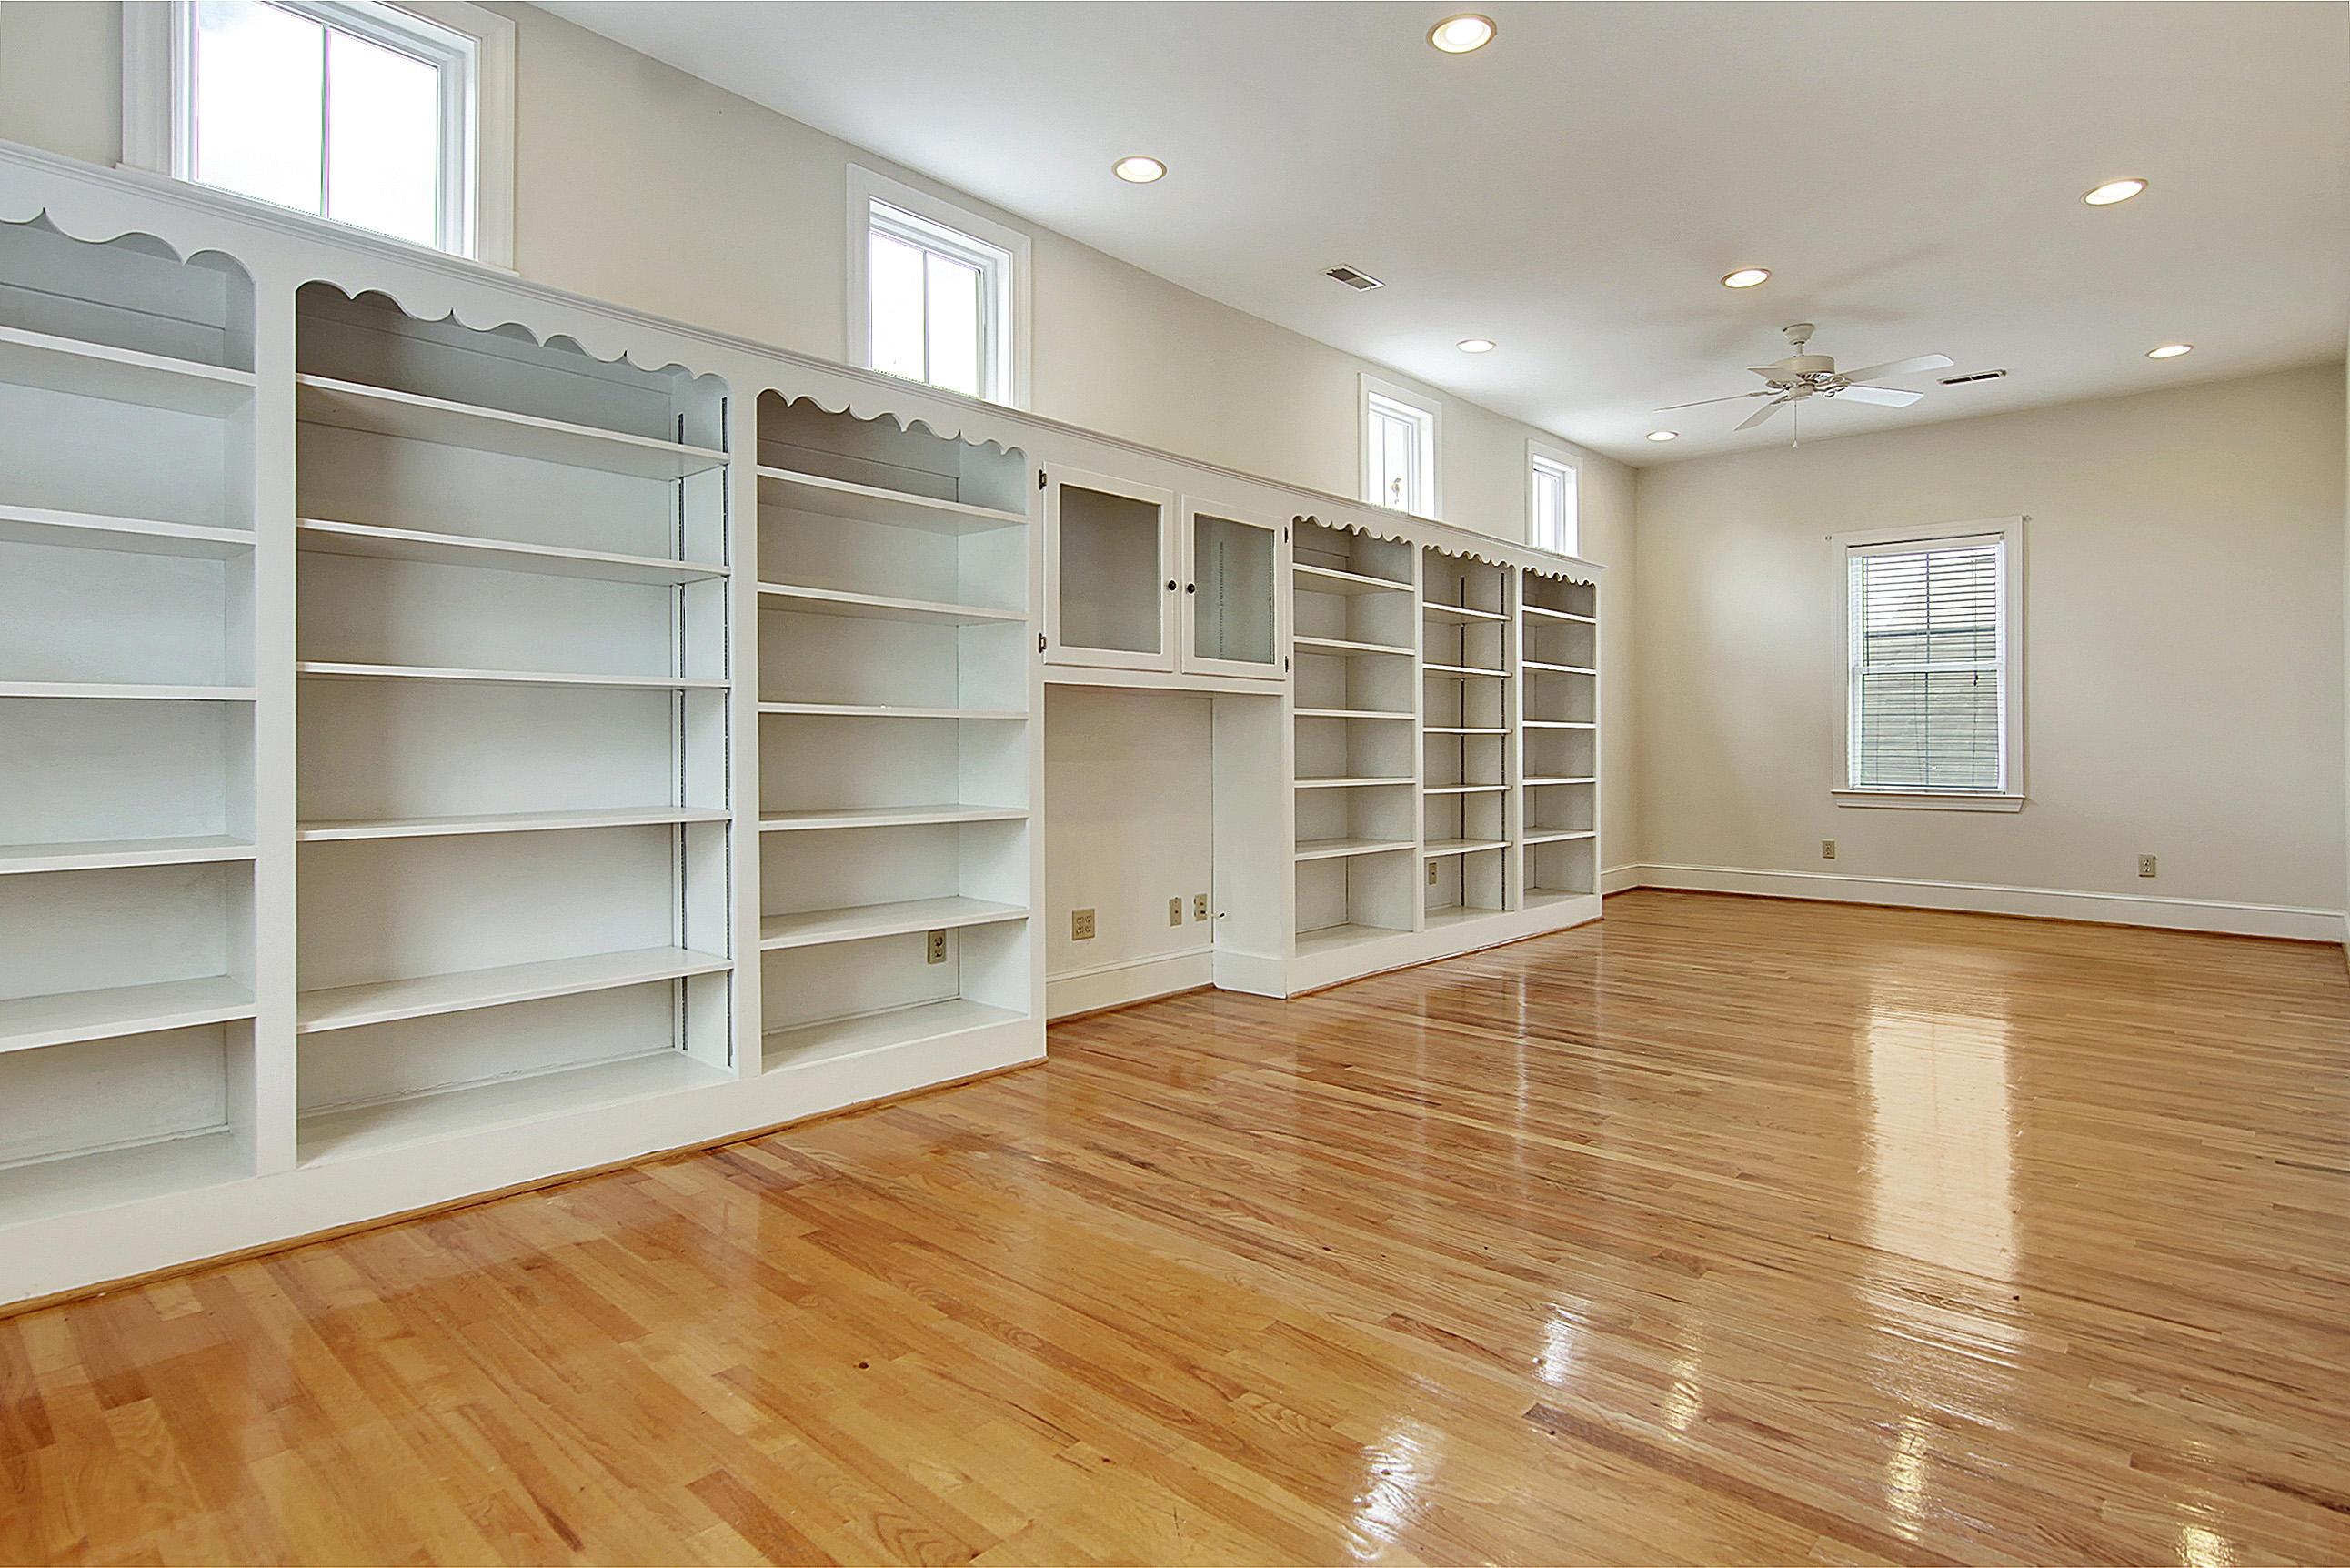 Wagener Terrace Homes For Sale - 136 Darlington, Charleston, SC - 1